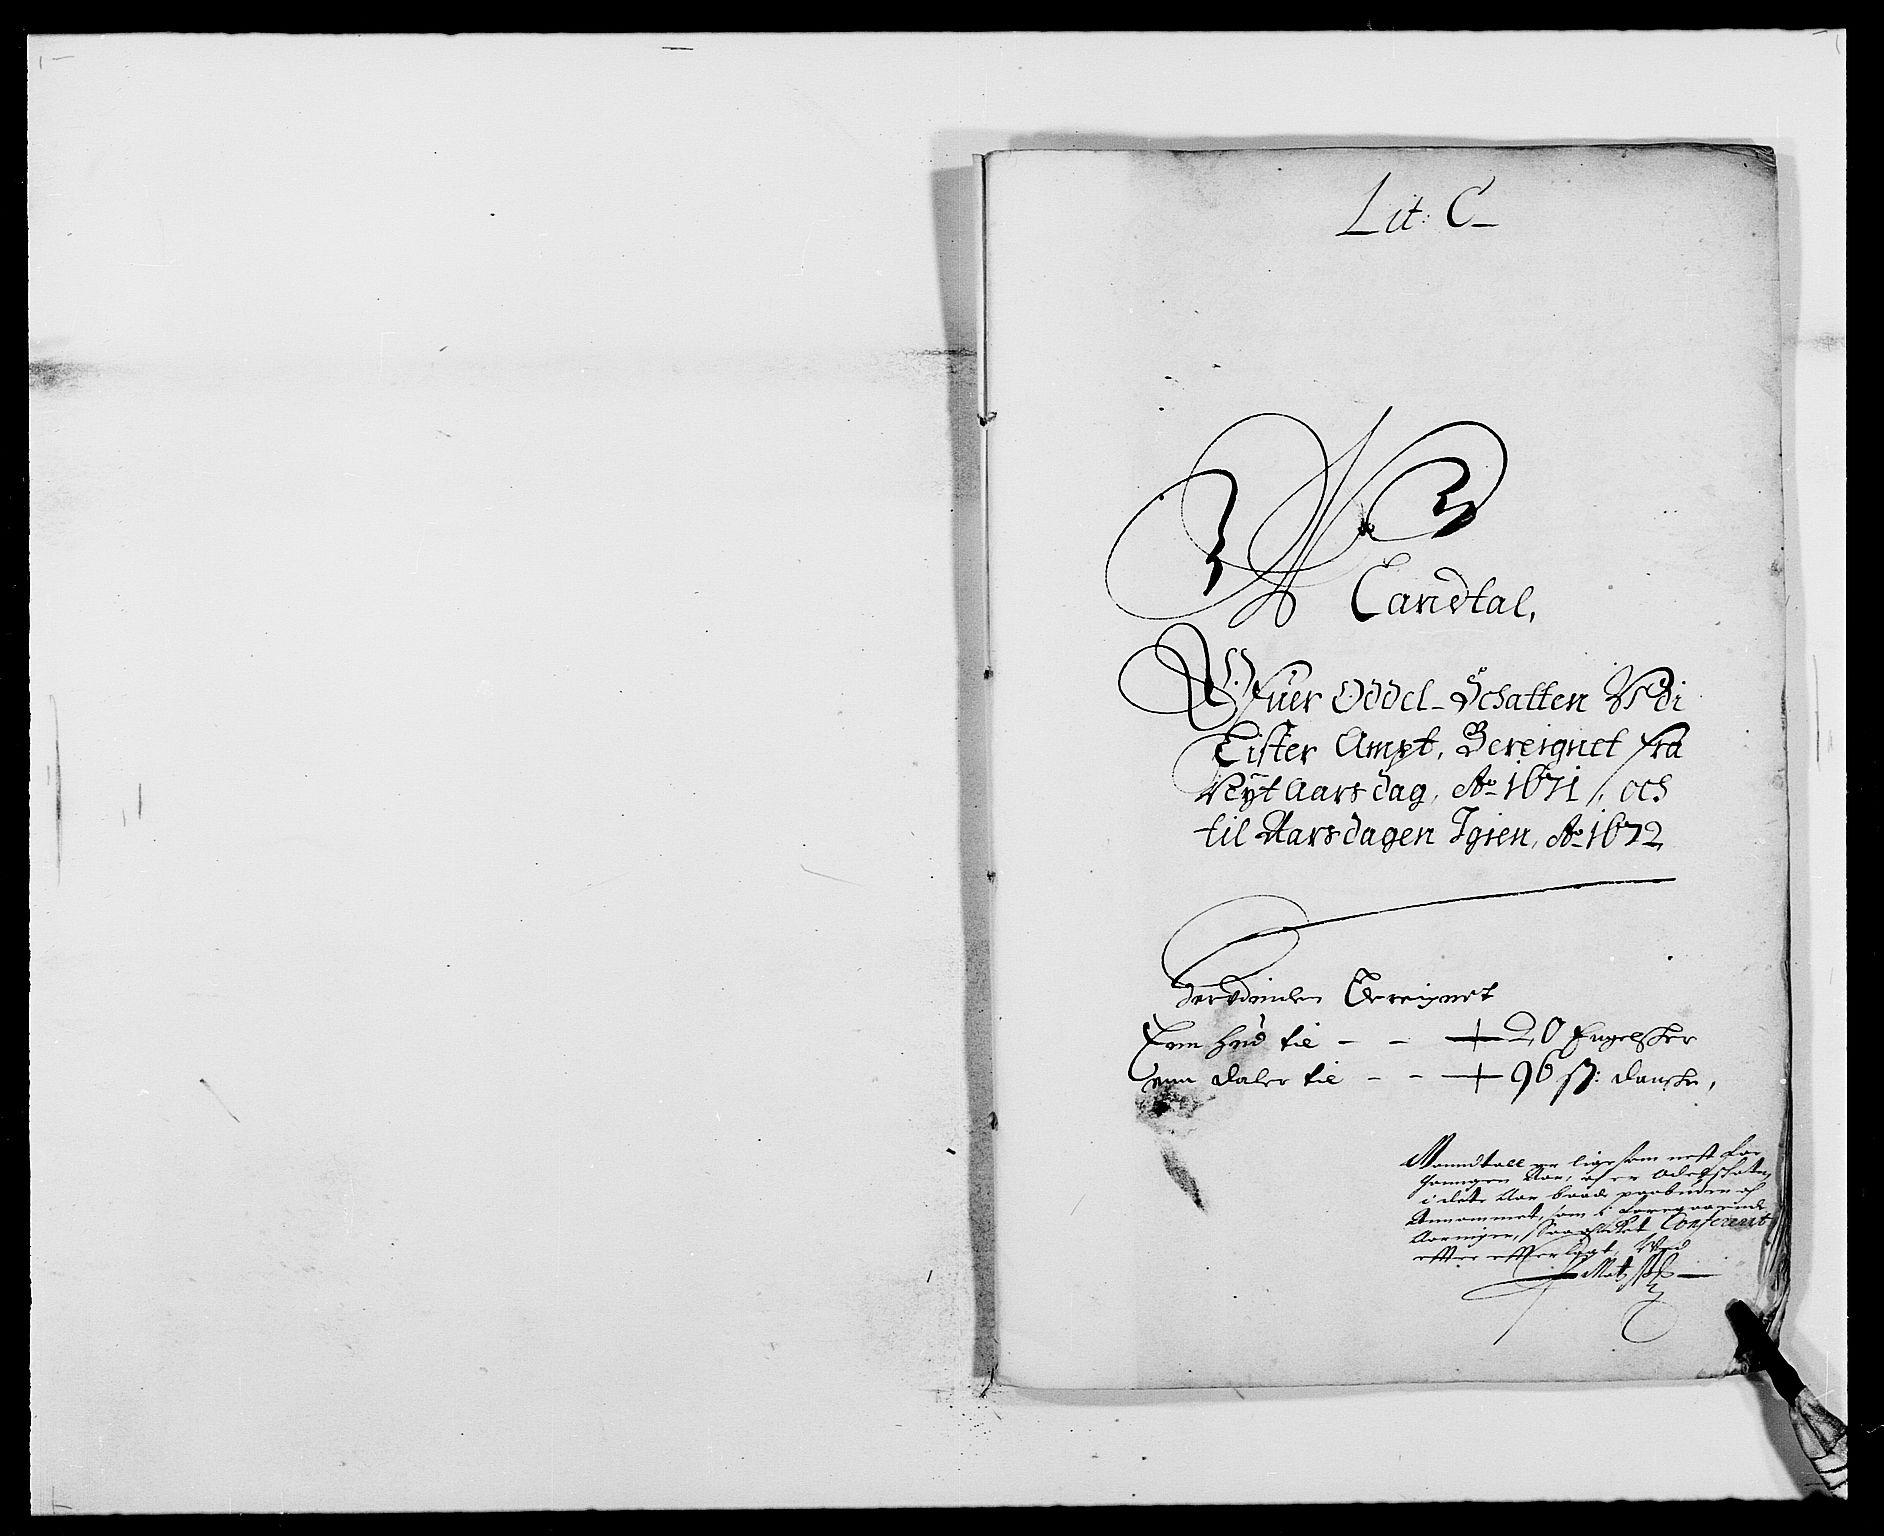 RA, Rentekammeret inntil 1814, Reviderte regnskaper, Fogderegnskap, R41/L2525: Fogderegnskap Lista, 1669-1671, s. 280